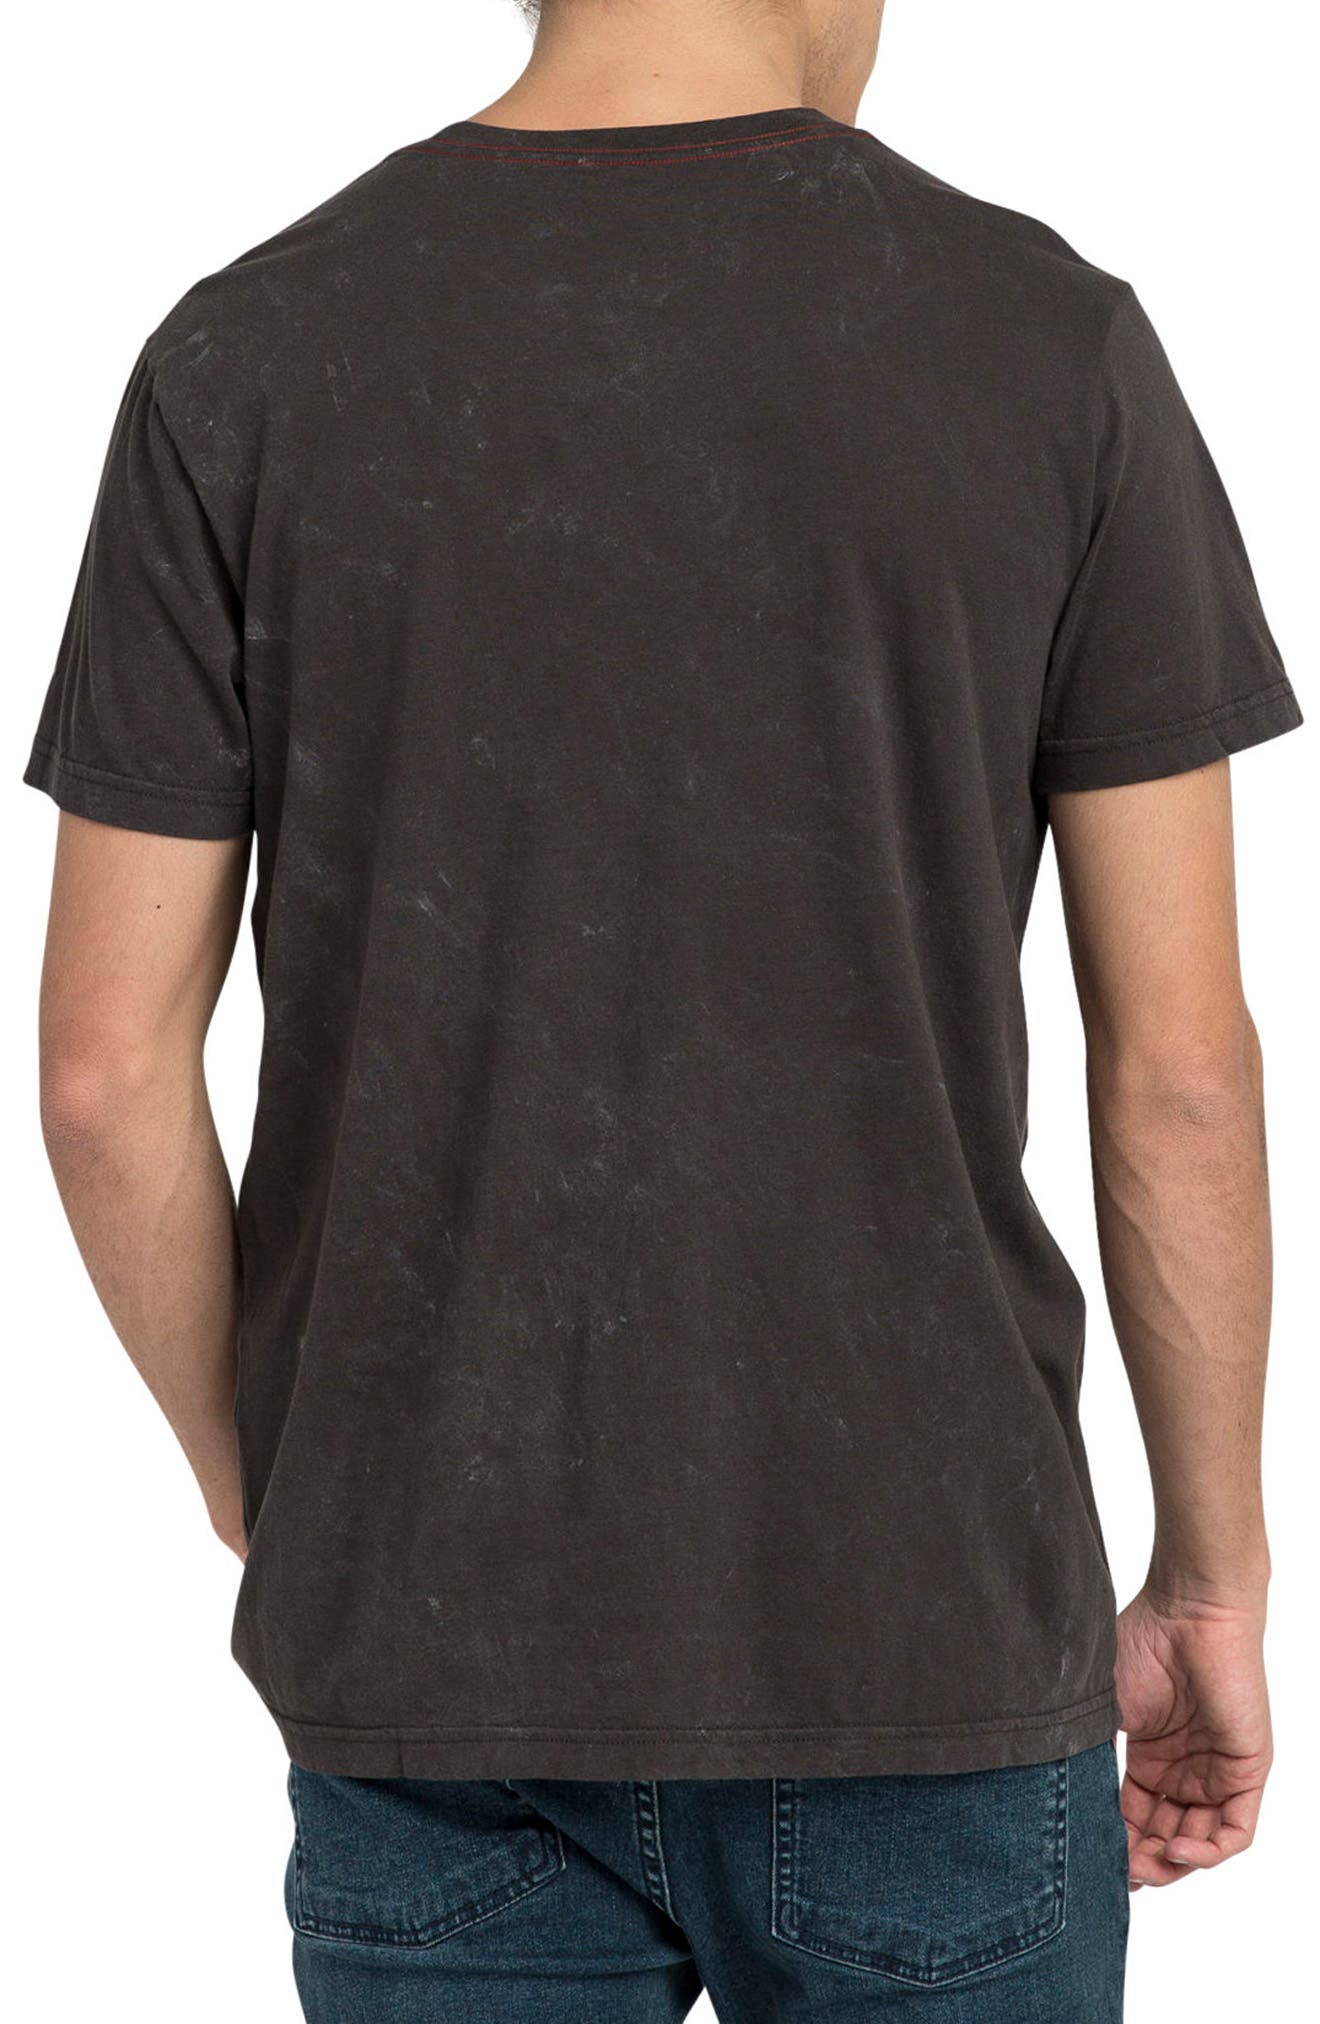 Big Deal T-Shirt,                             Alternate thumbnail 2, color,                             Pirate Black